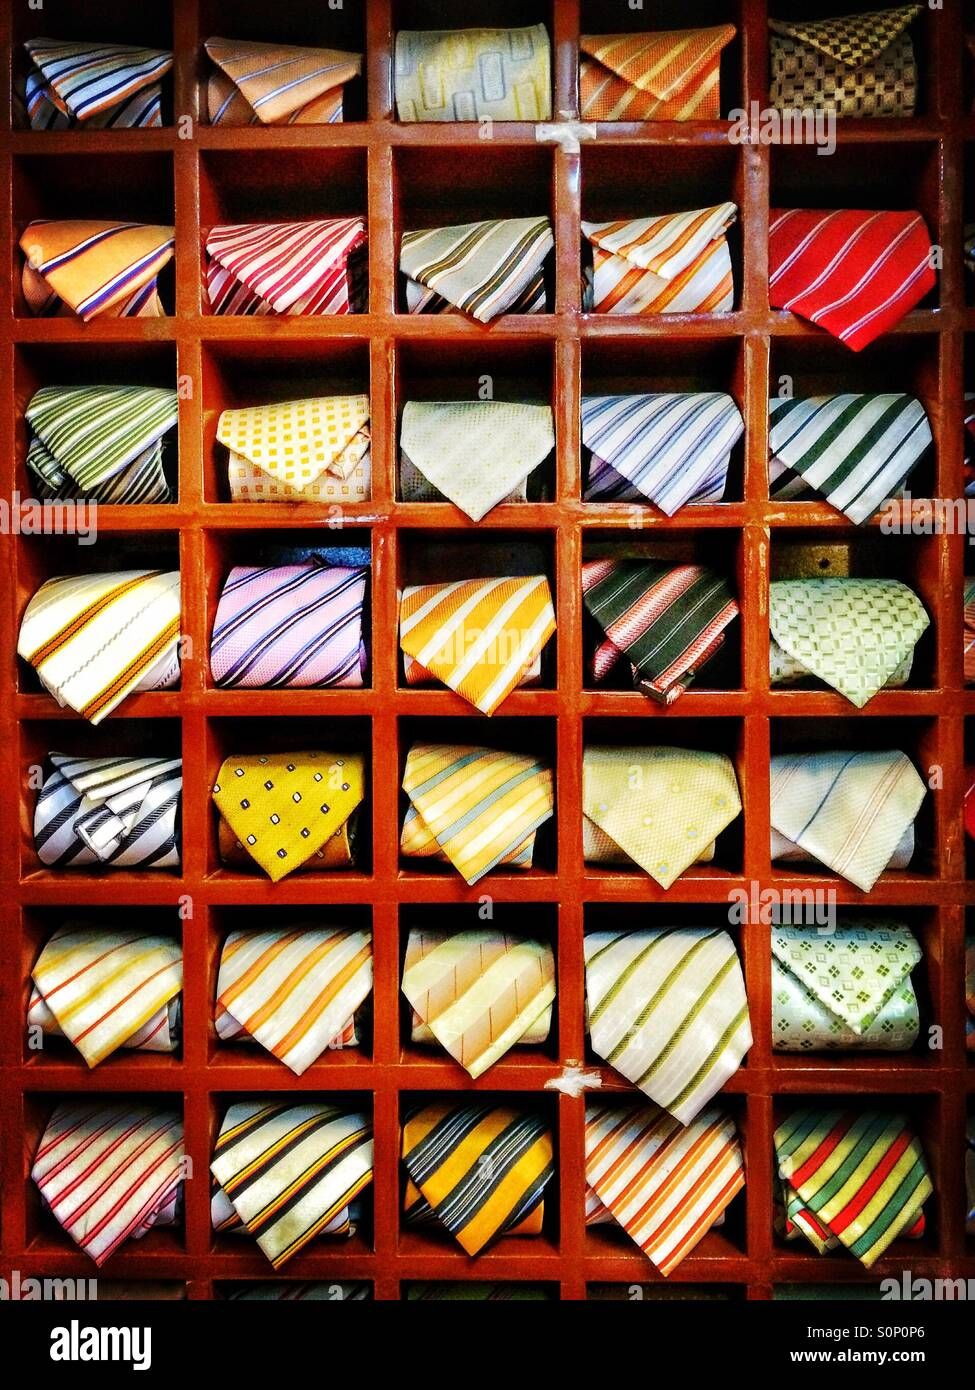 Tie rack Stock Photo, Royalty Free Image: 310270190 - Alamy